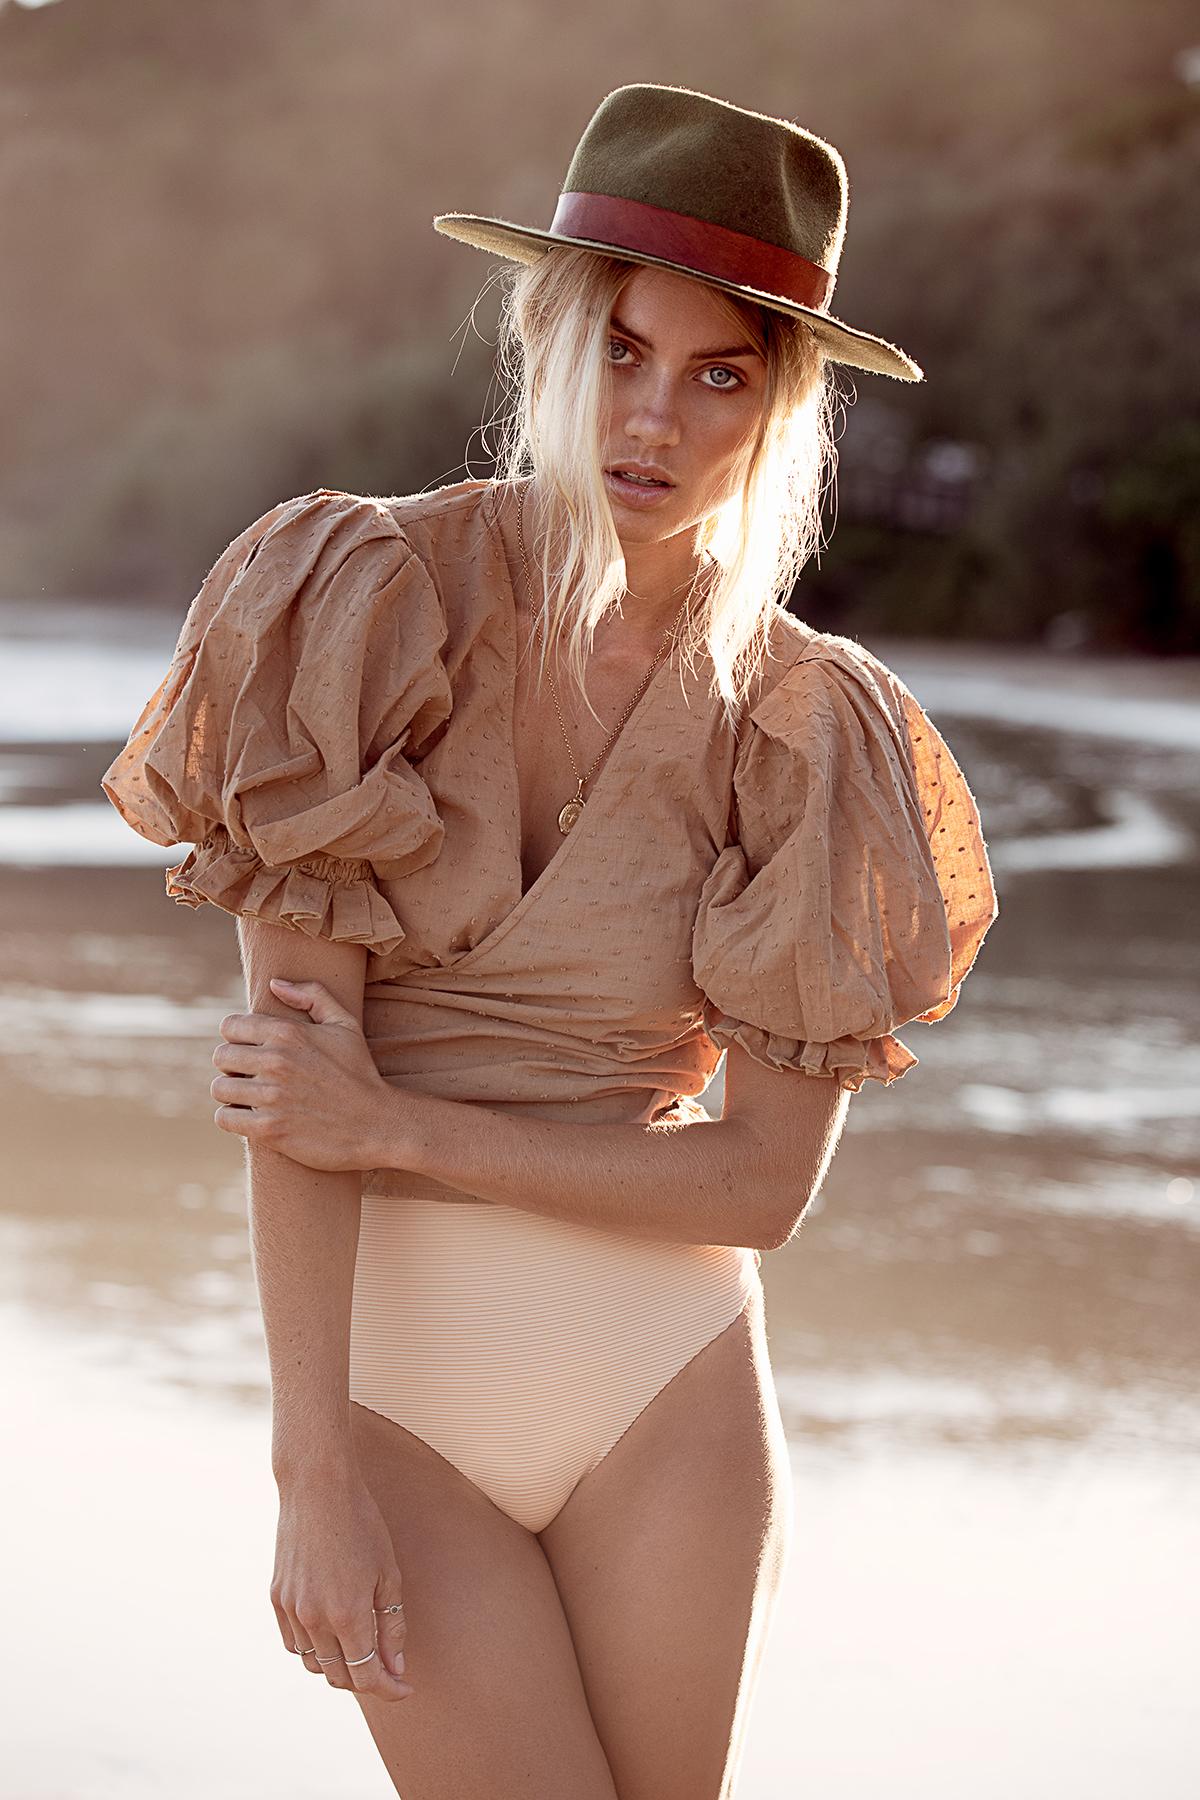 Elyse Knowles by Lauren Schulz